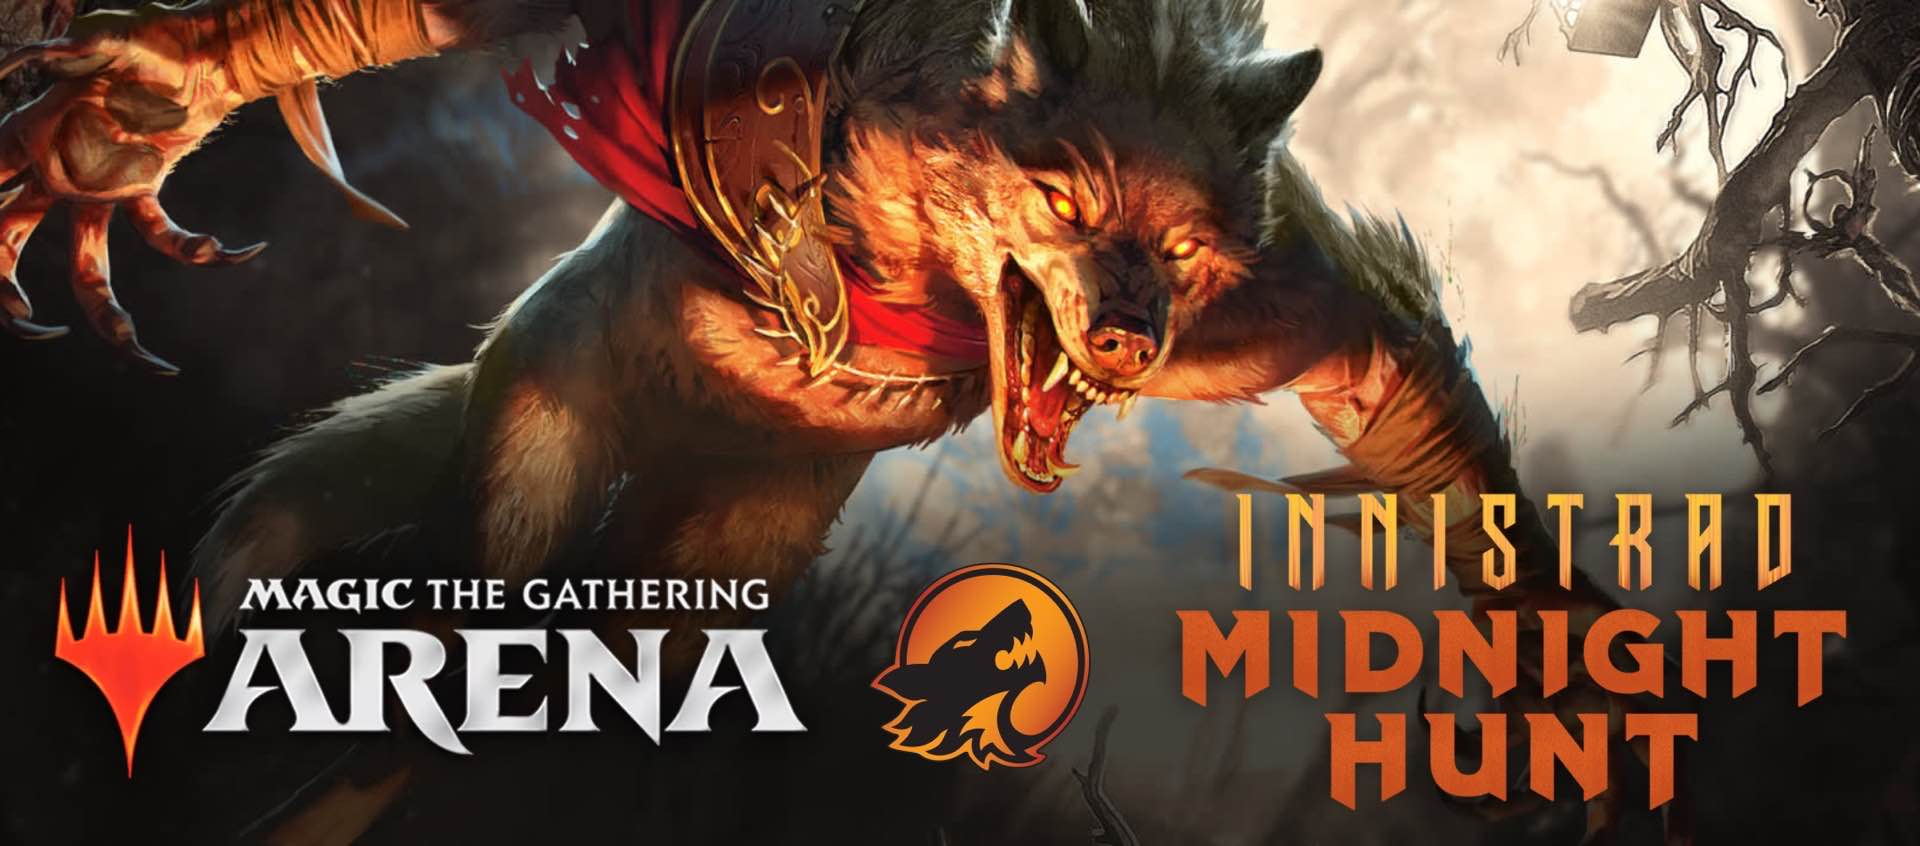 magic-the-gathering-arena-innistrad-midnight-hunt